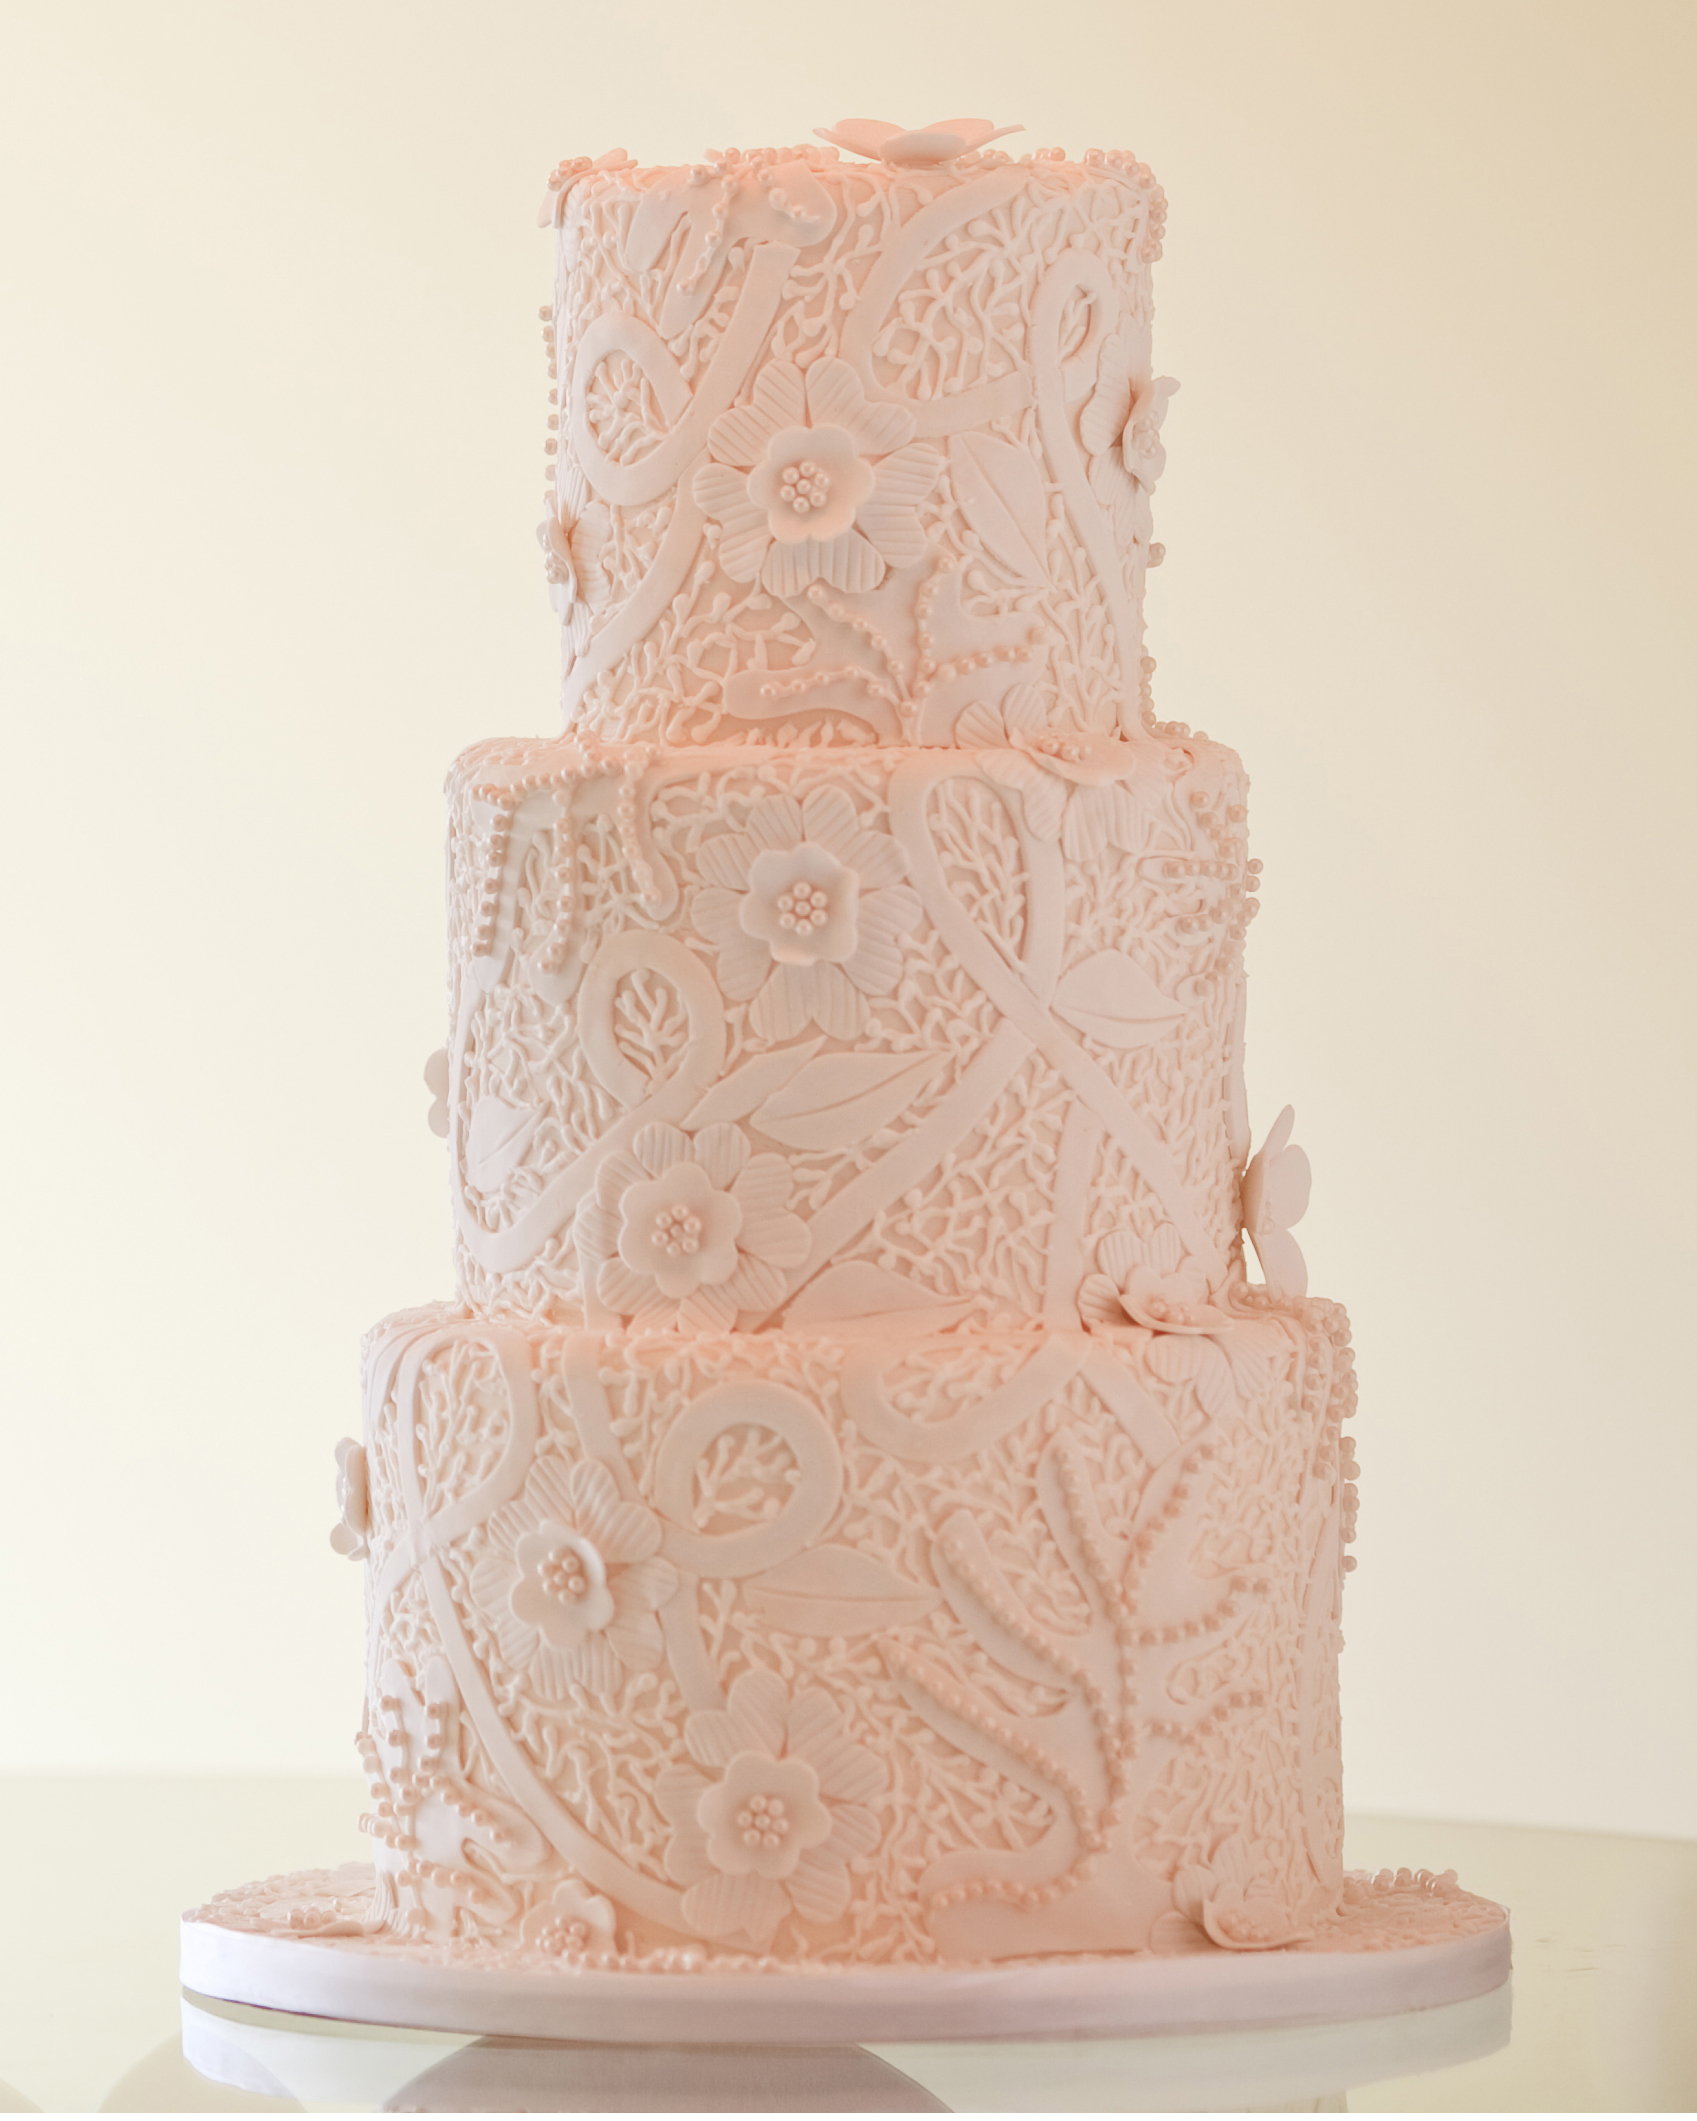 cake-pros-wowfactor-0414.jpg